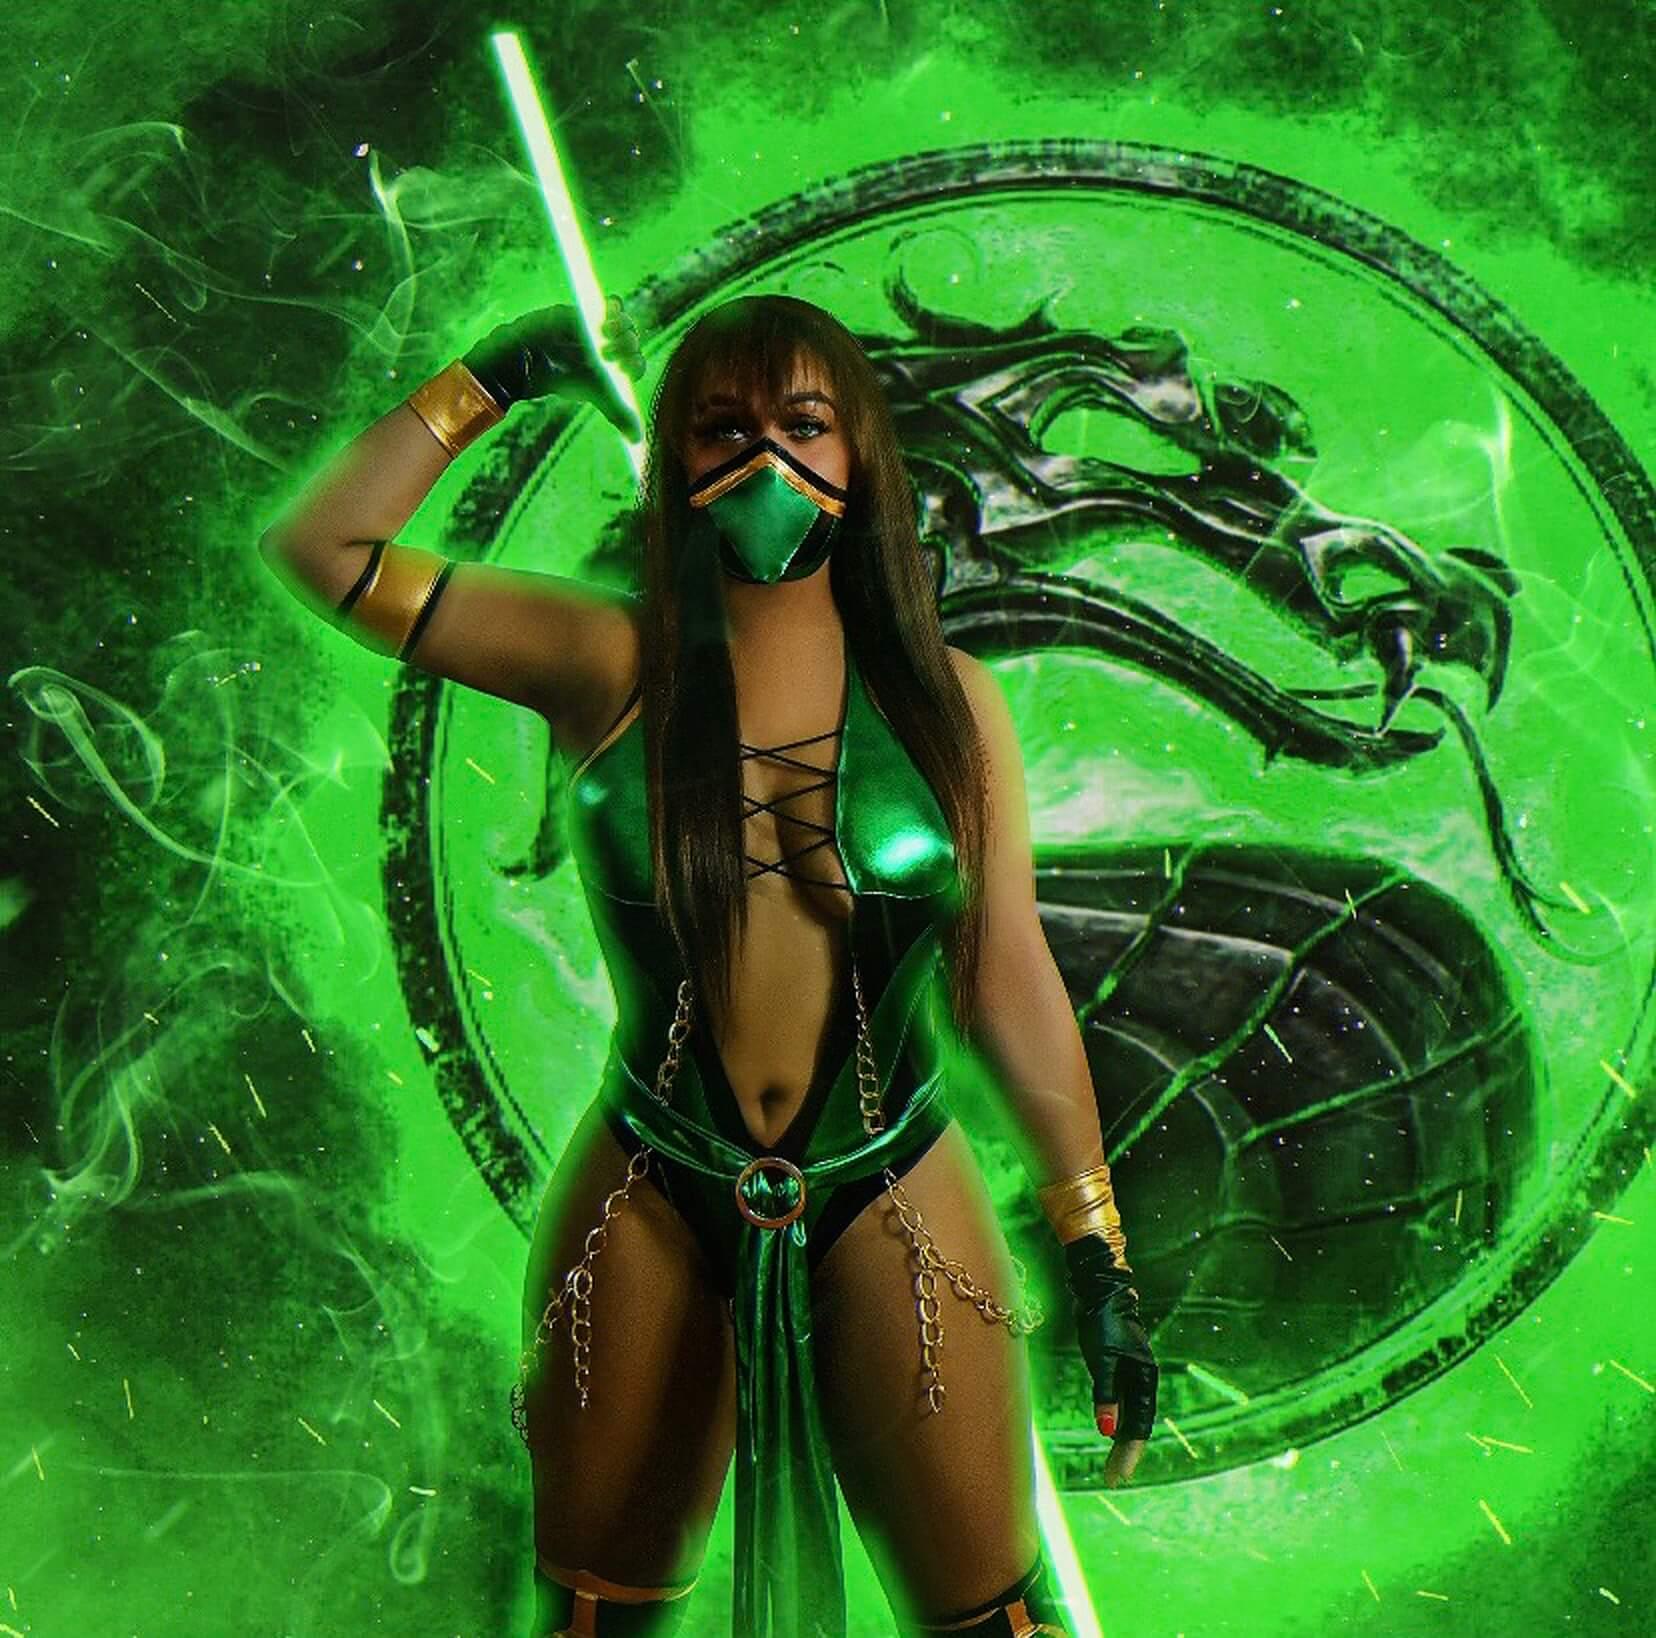 Briana-Amerson-cosplay-outfit-Psychokittykatgaming